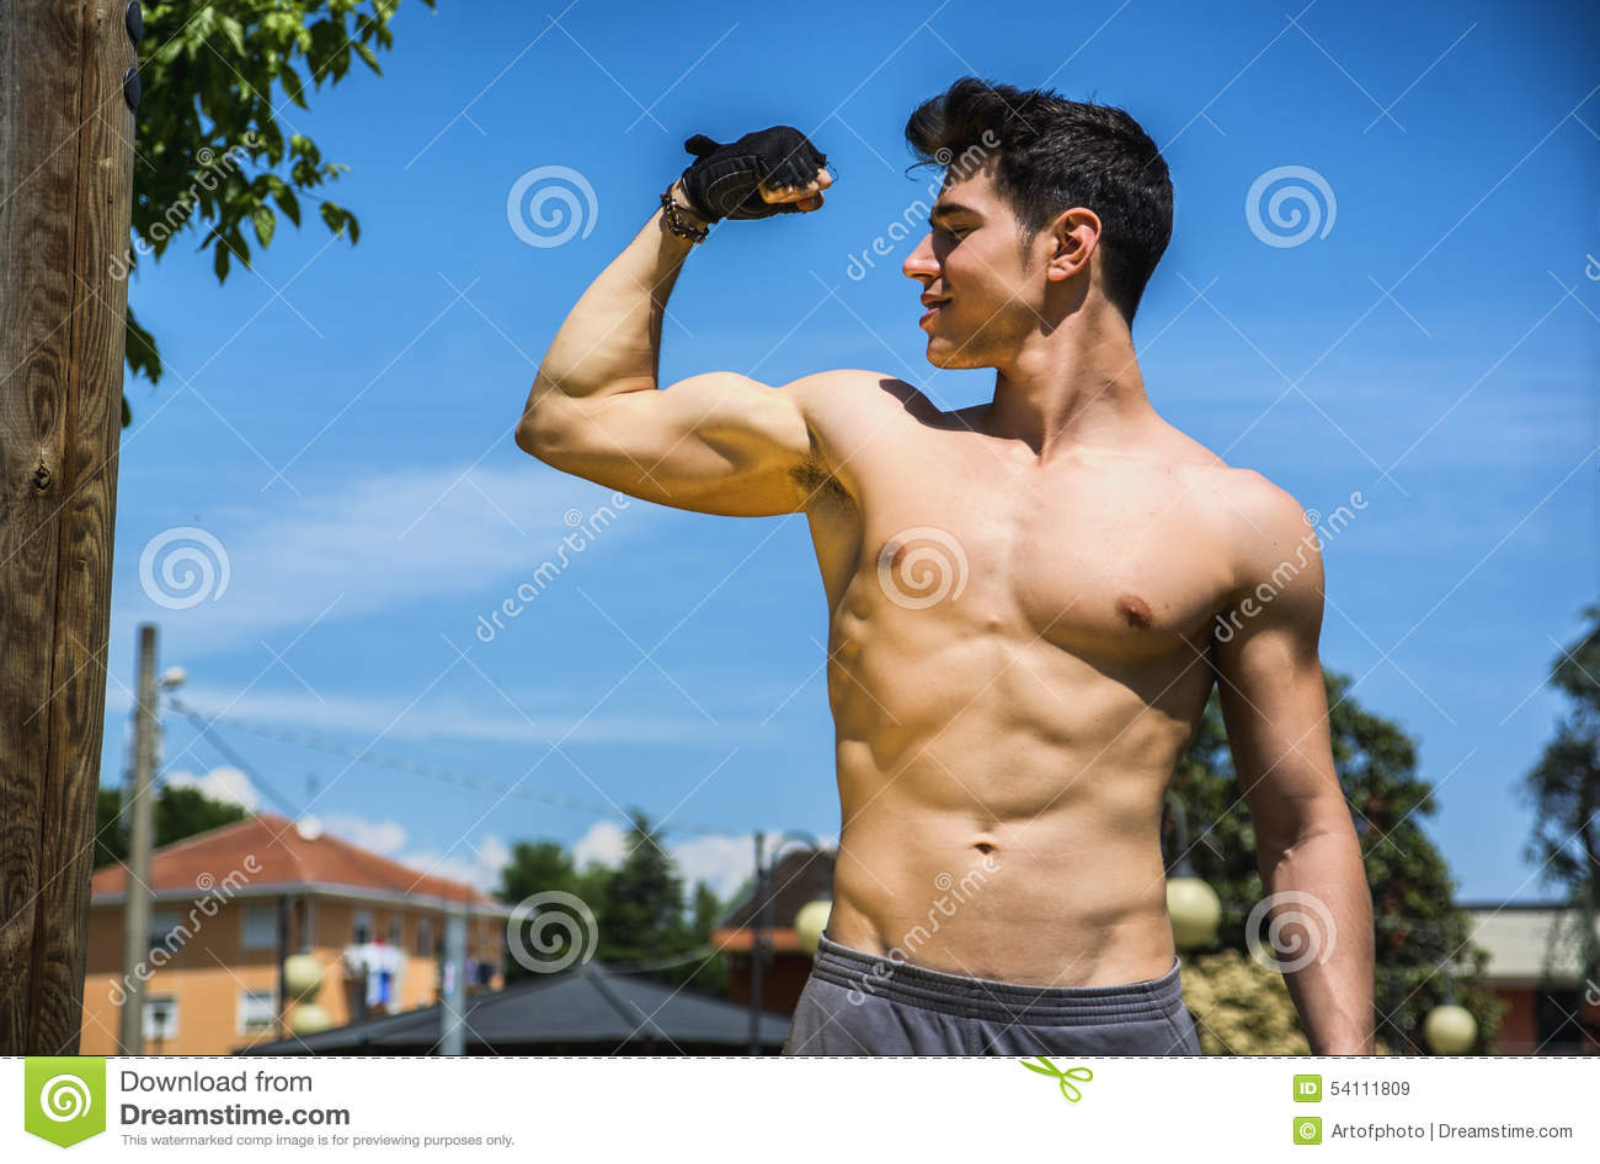 Fallen For Muscular Dude Of His Dreams